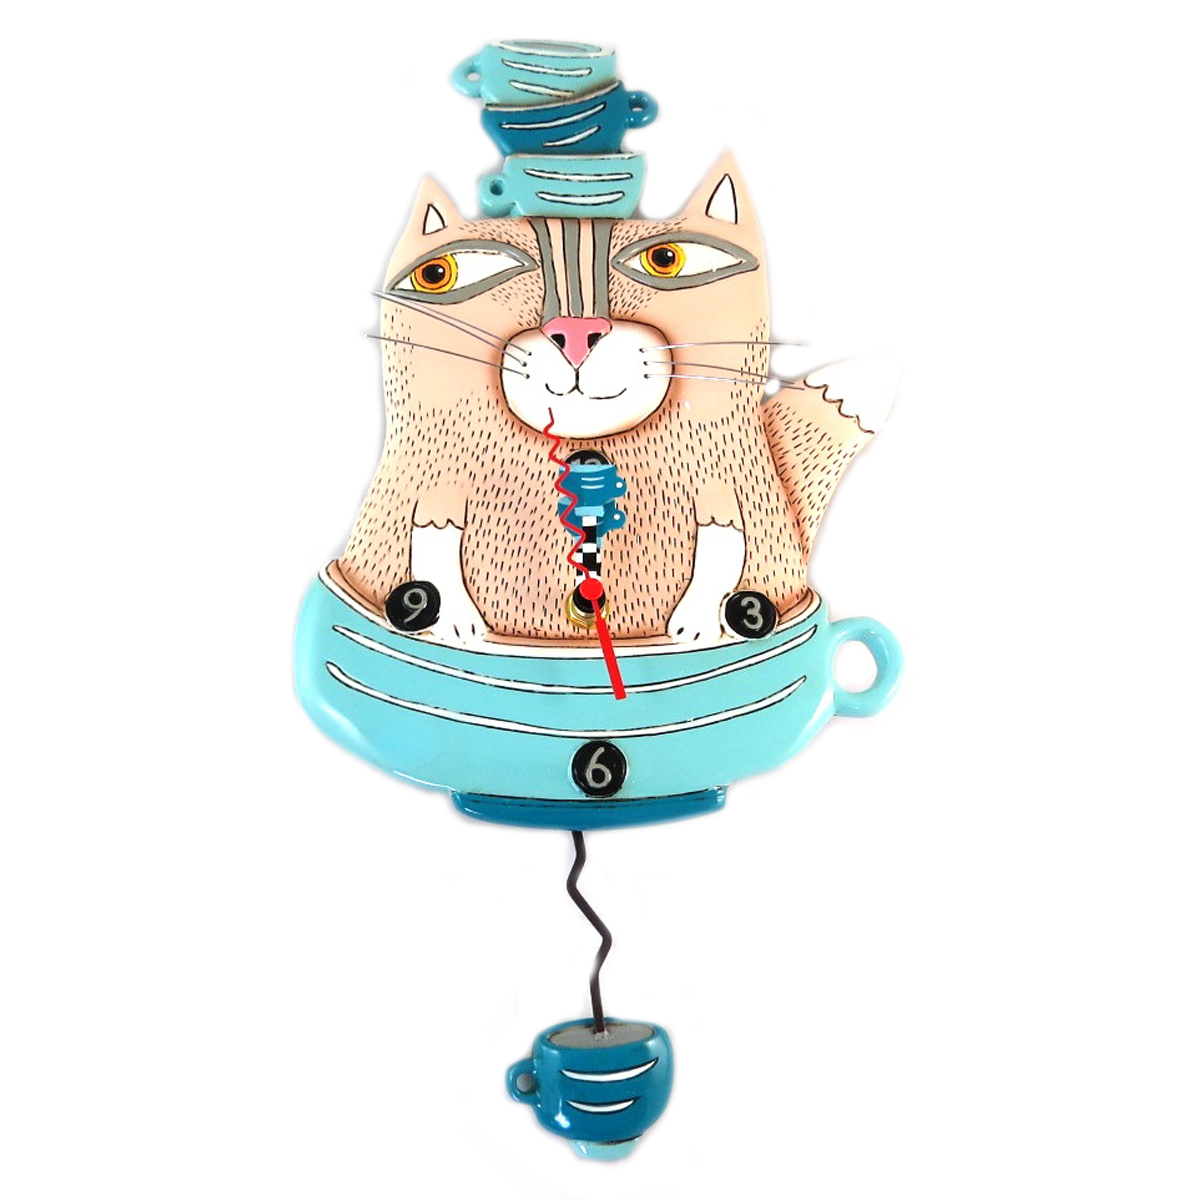 Horloge Murale \'Allen Designs\' beige turquoise (chat et tasses) - 36x19 cm - [P9087]